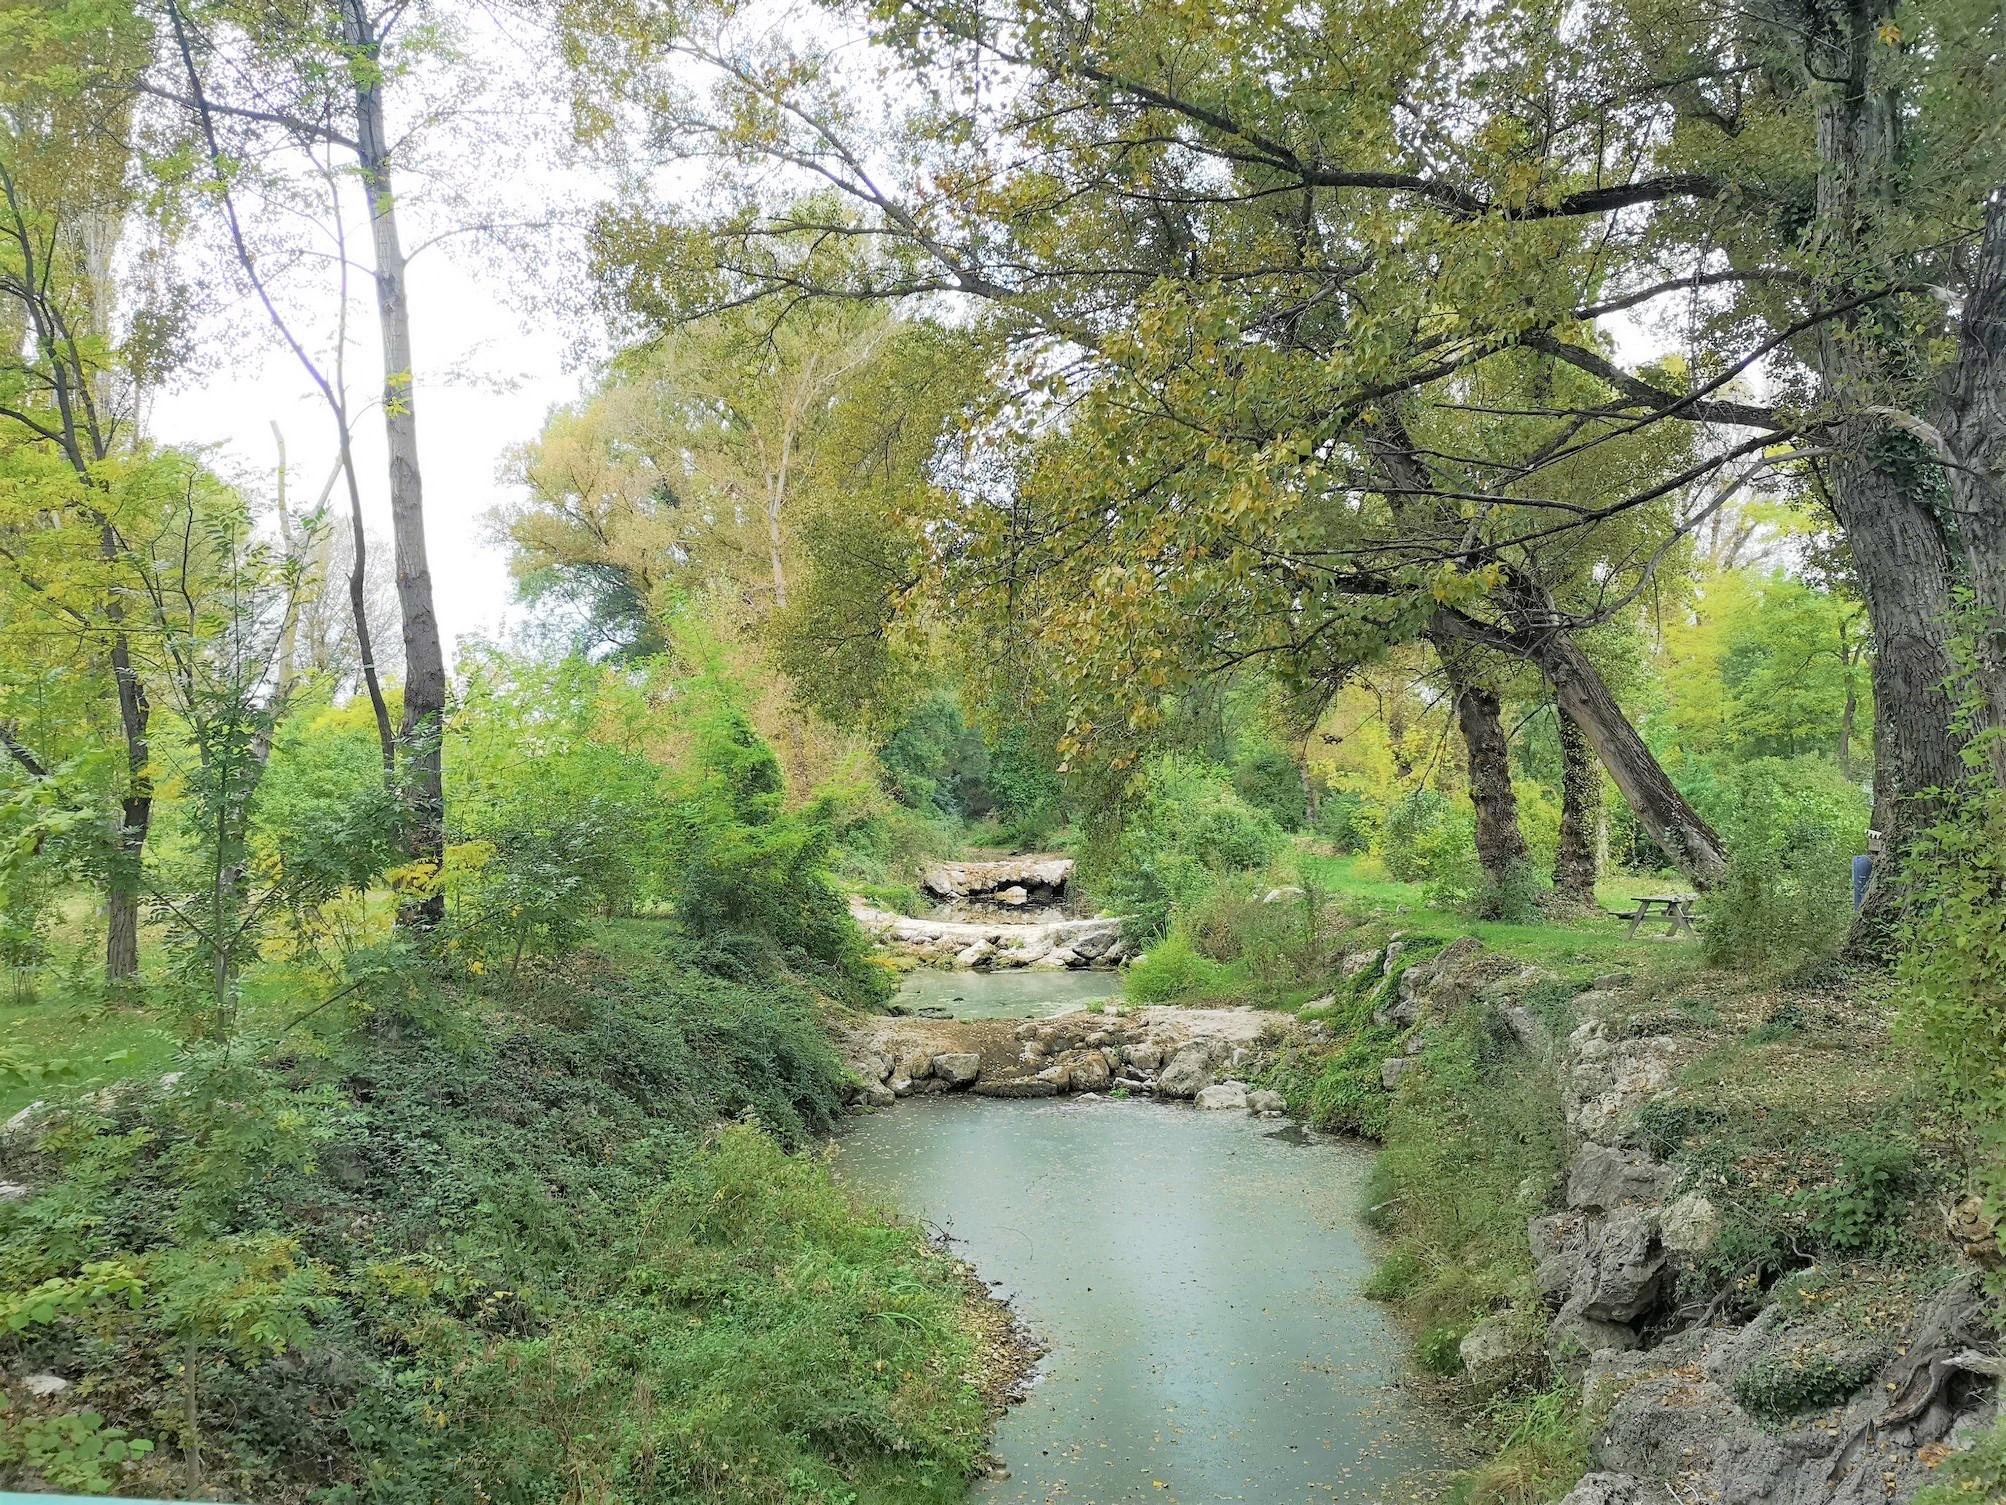 Paca camping vendre avec acc s direct rivi re ref ca - Camping aix en provence avec piscine ...